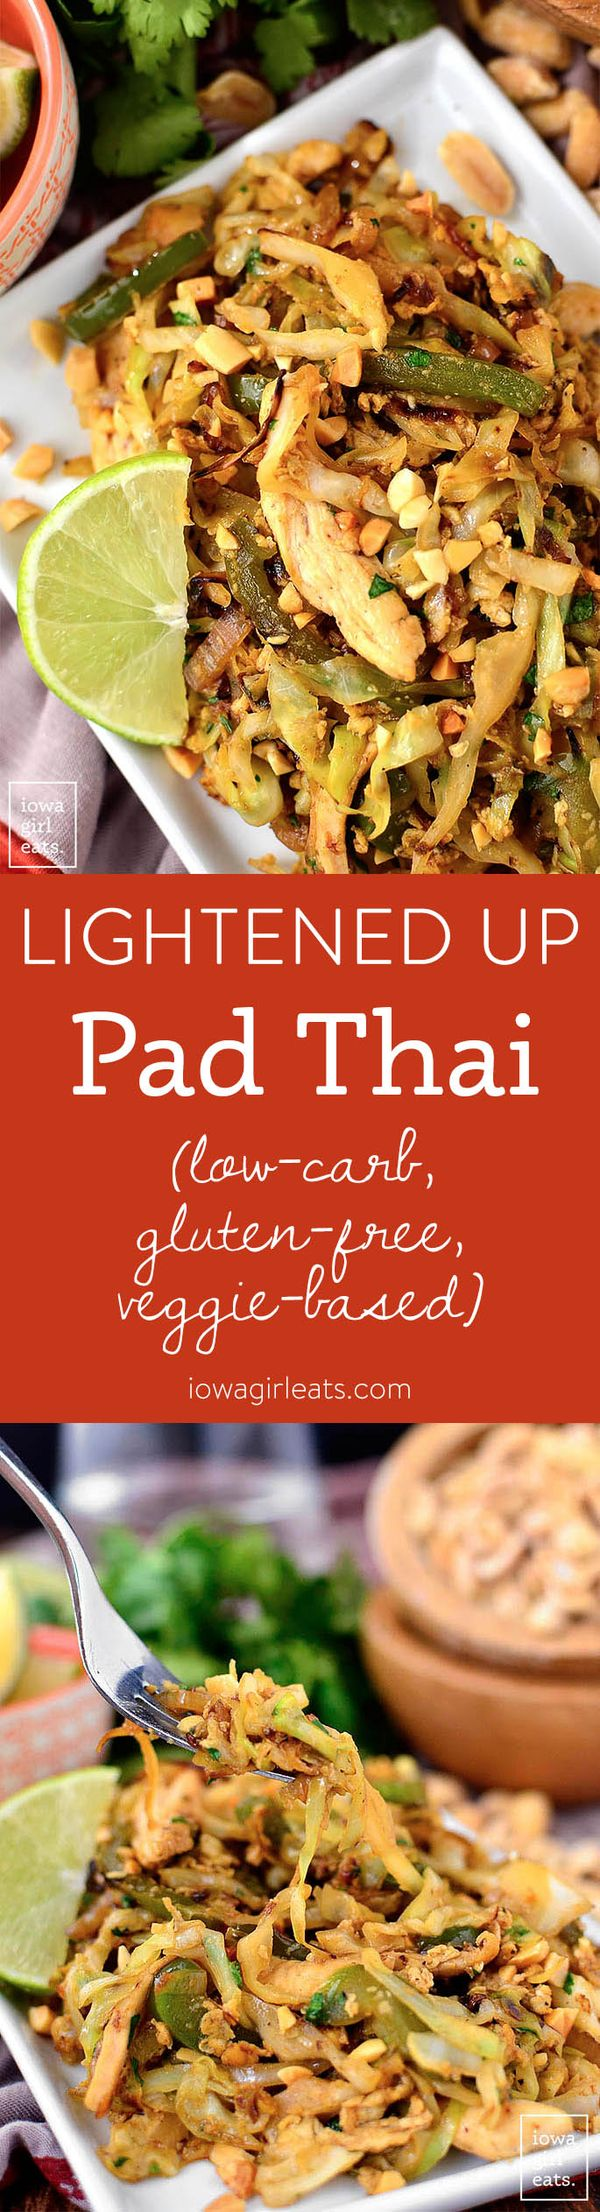 Lightened Up Pad Thai